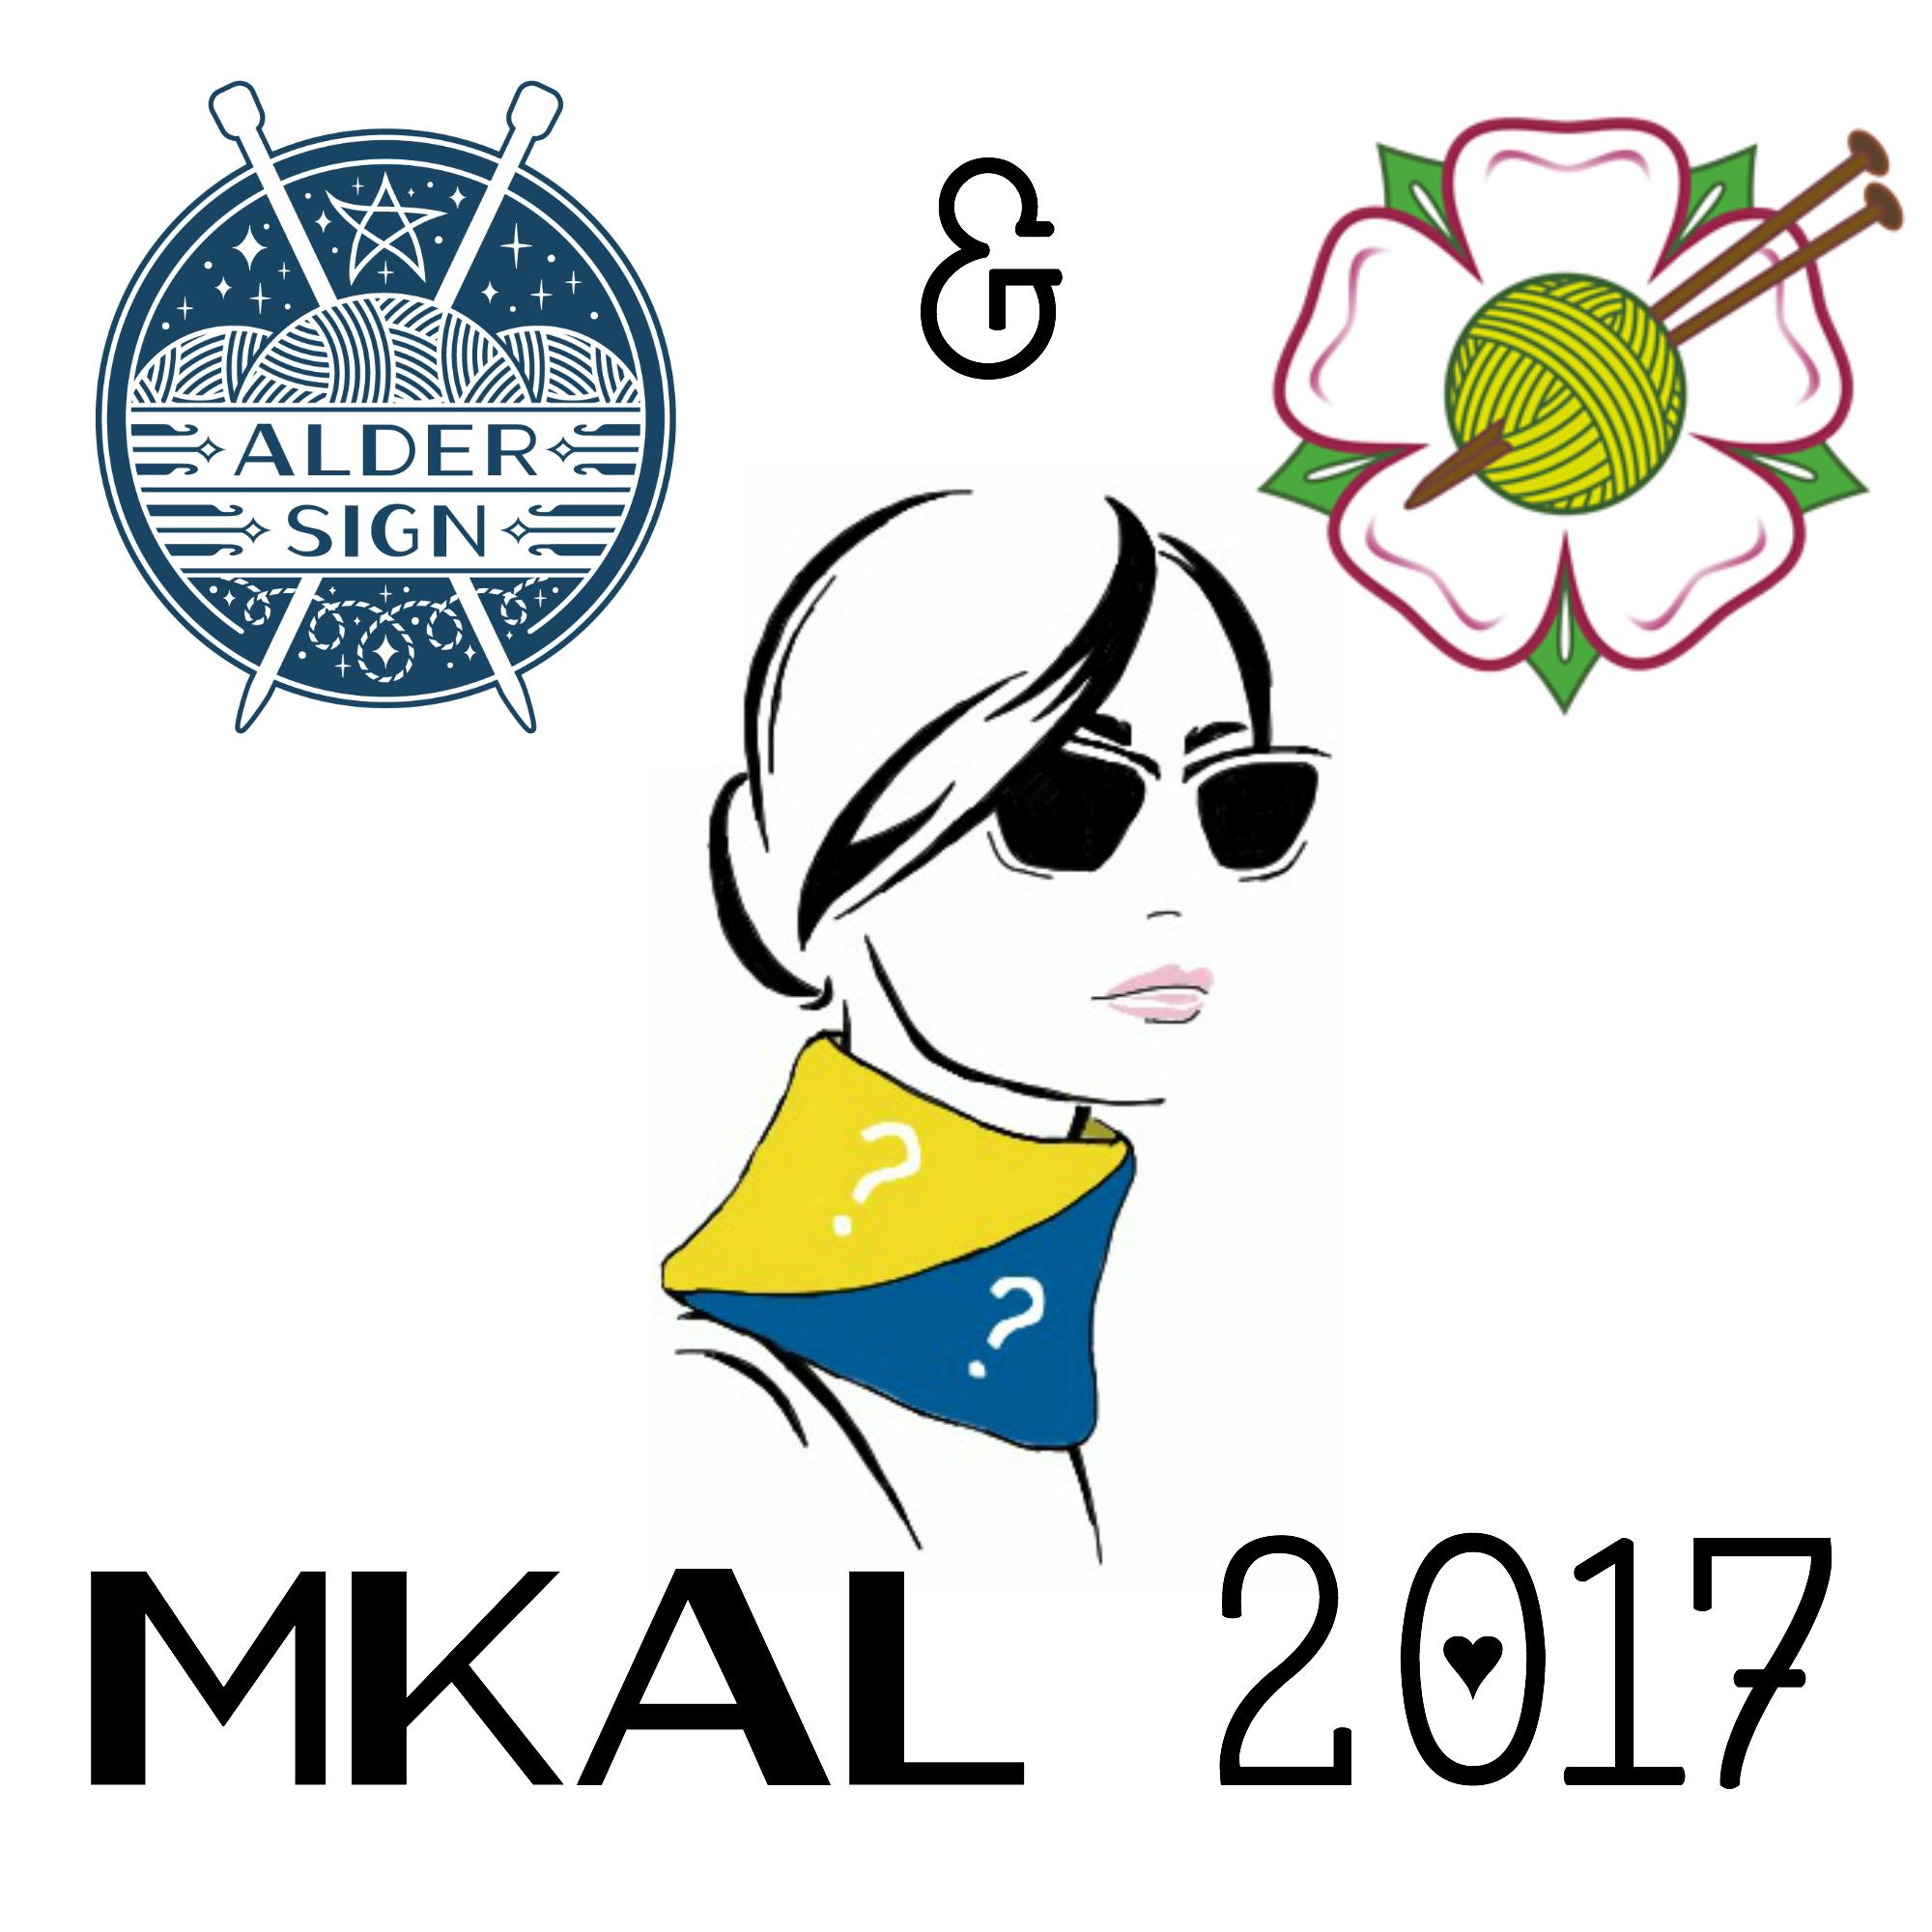 Neck & Neck! MKAL logo